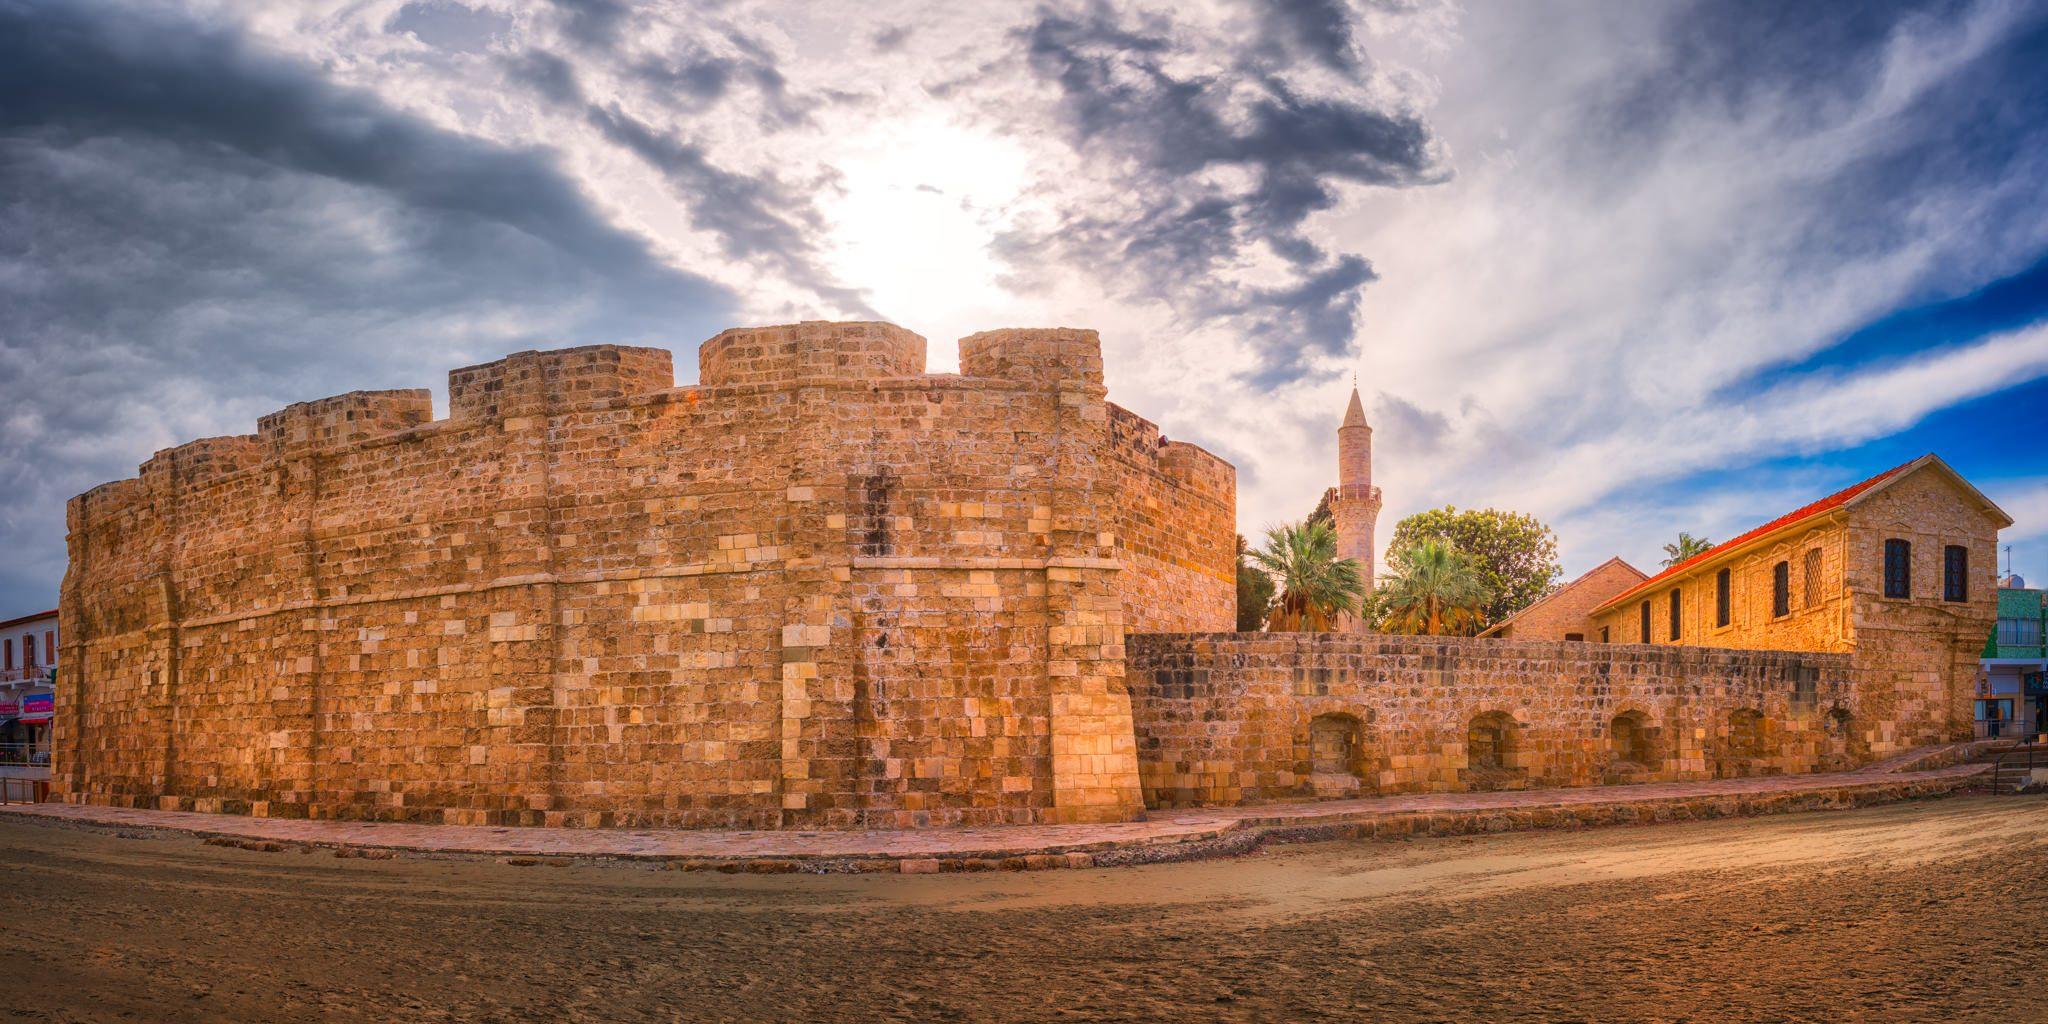 Cyprus – Larnaca Castle on the beach.